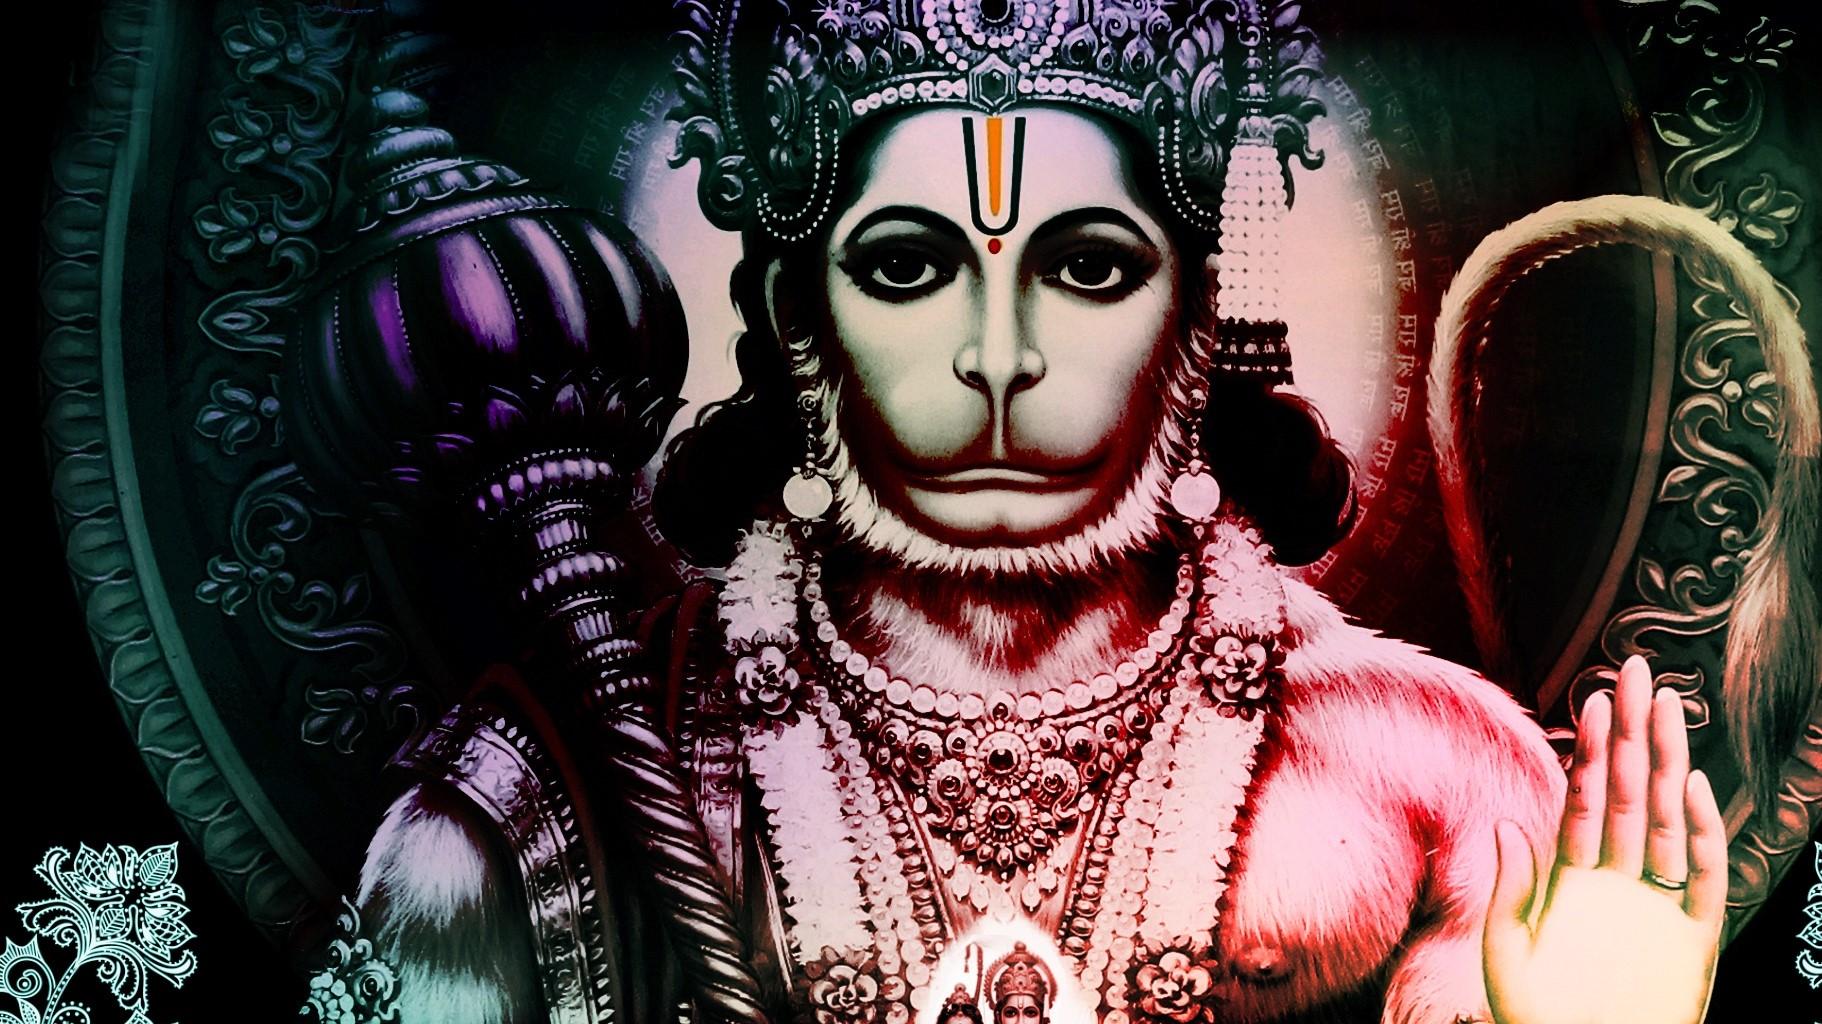 lord hanuman hd for desktop background picture rocking avante biz